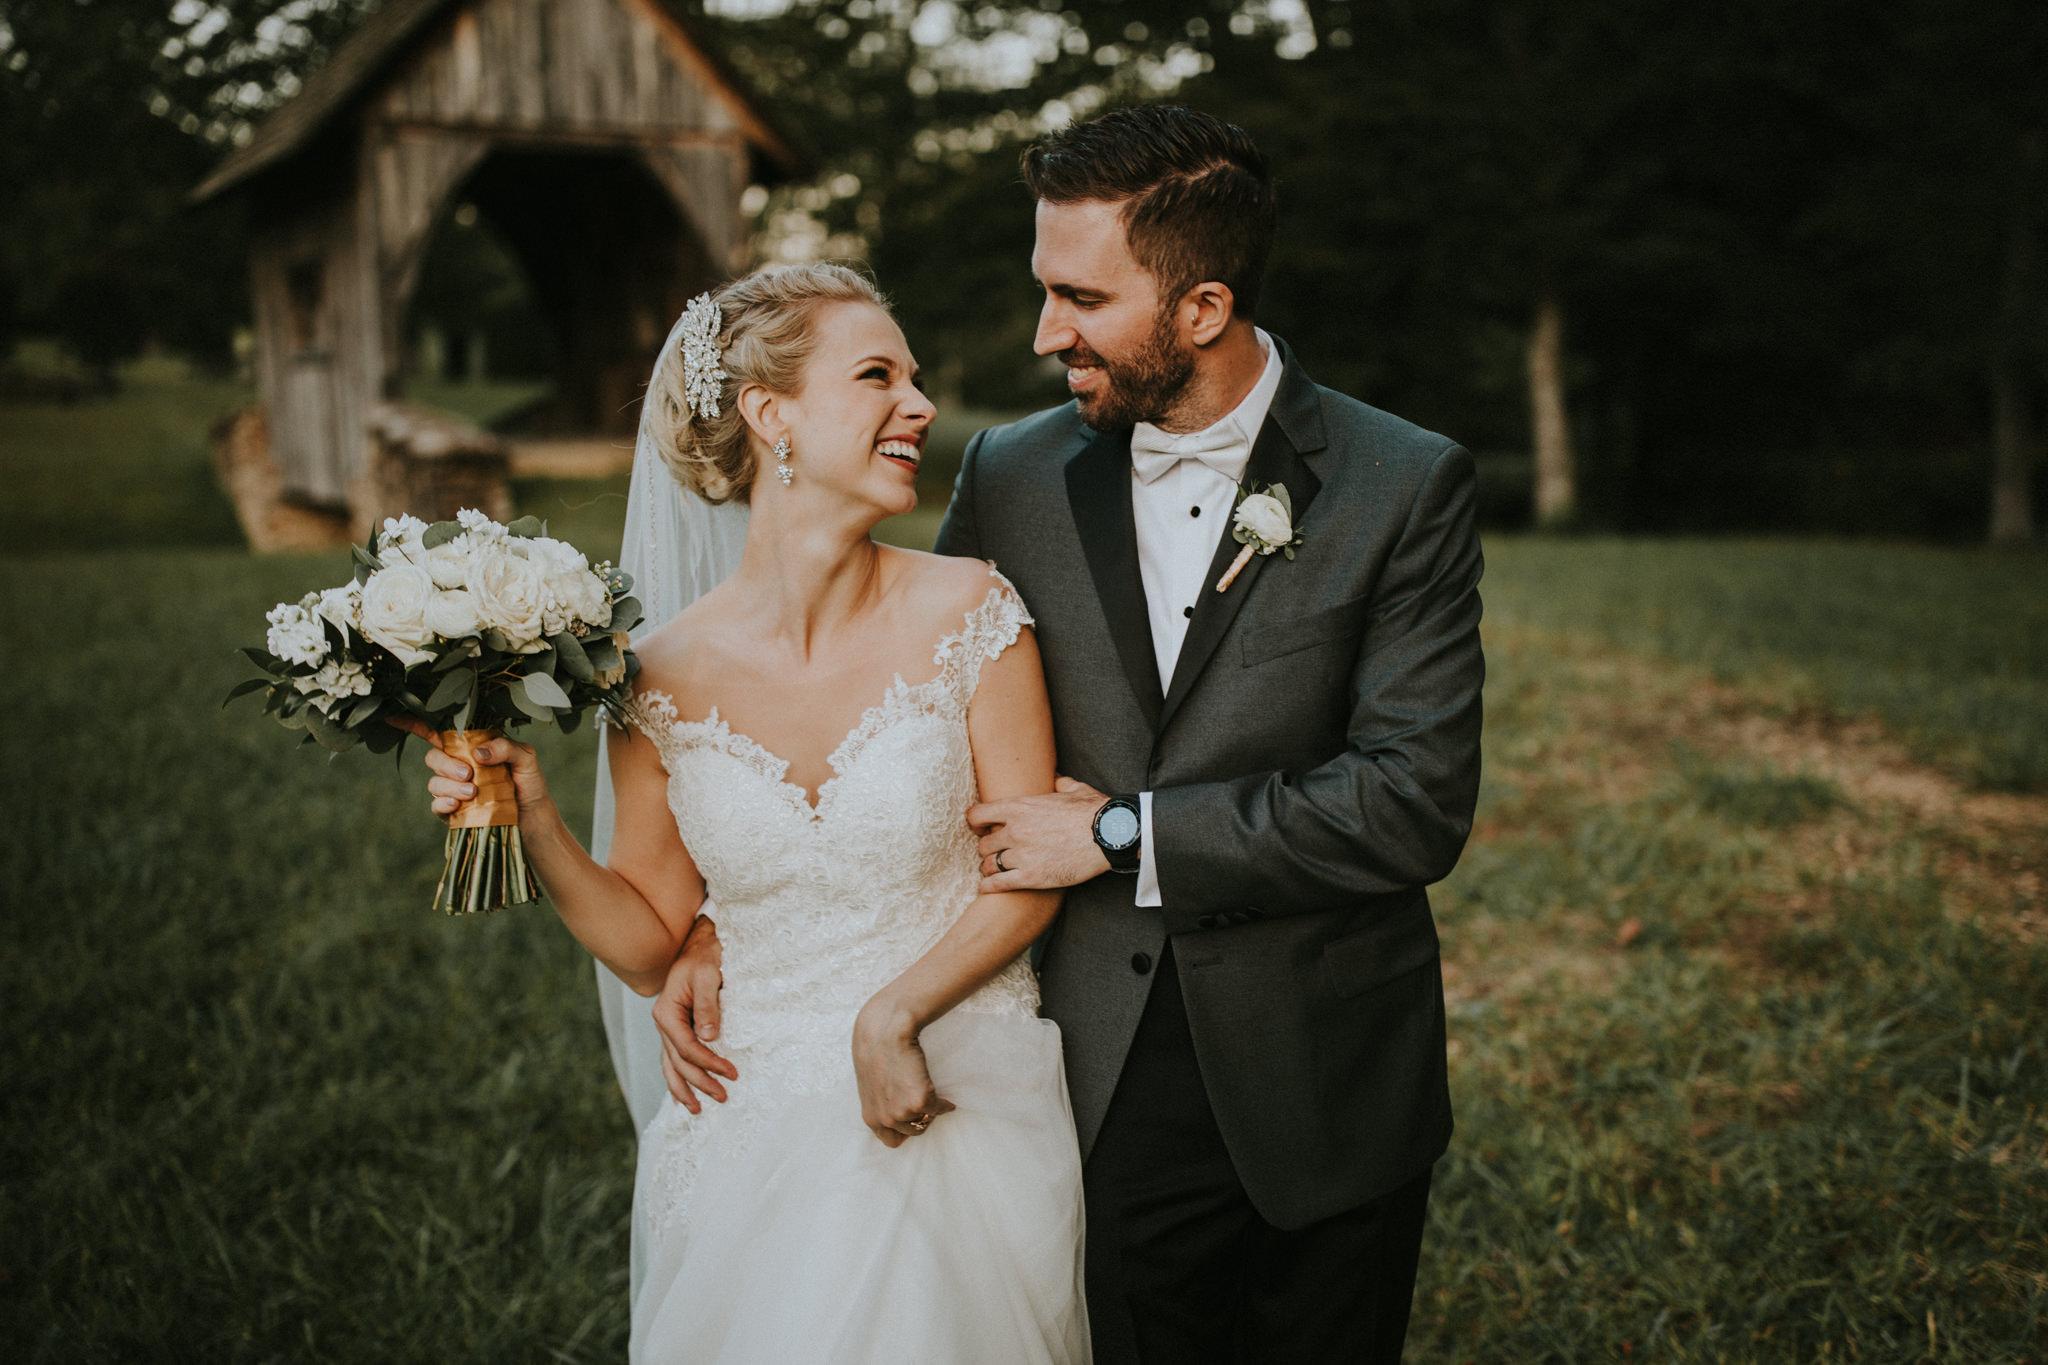 Wedding Photographer Little Rock